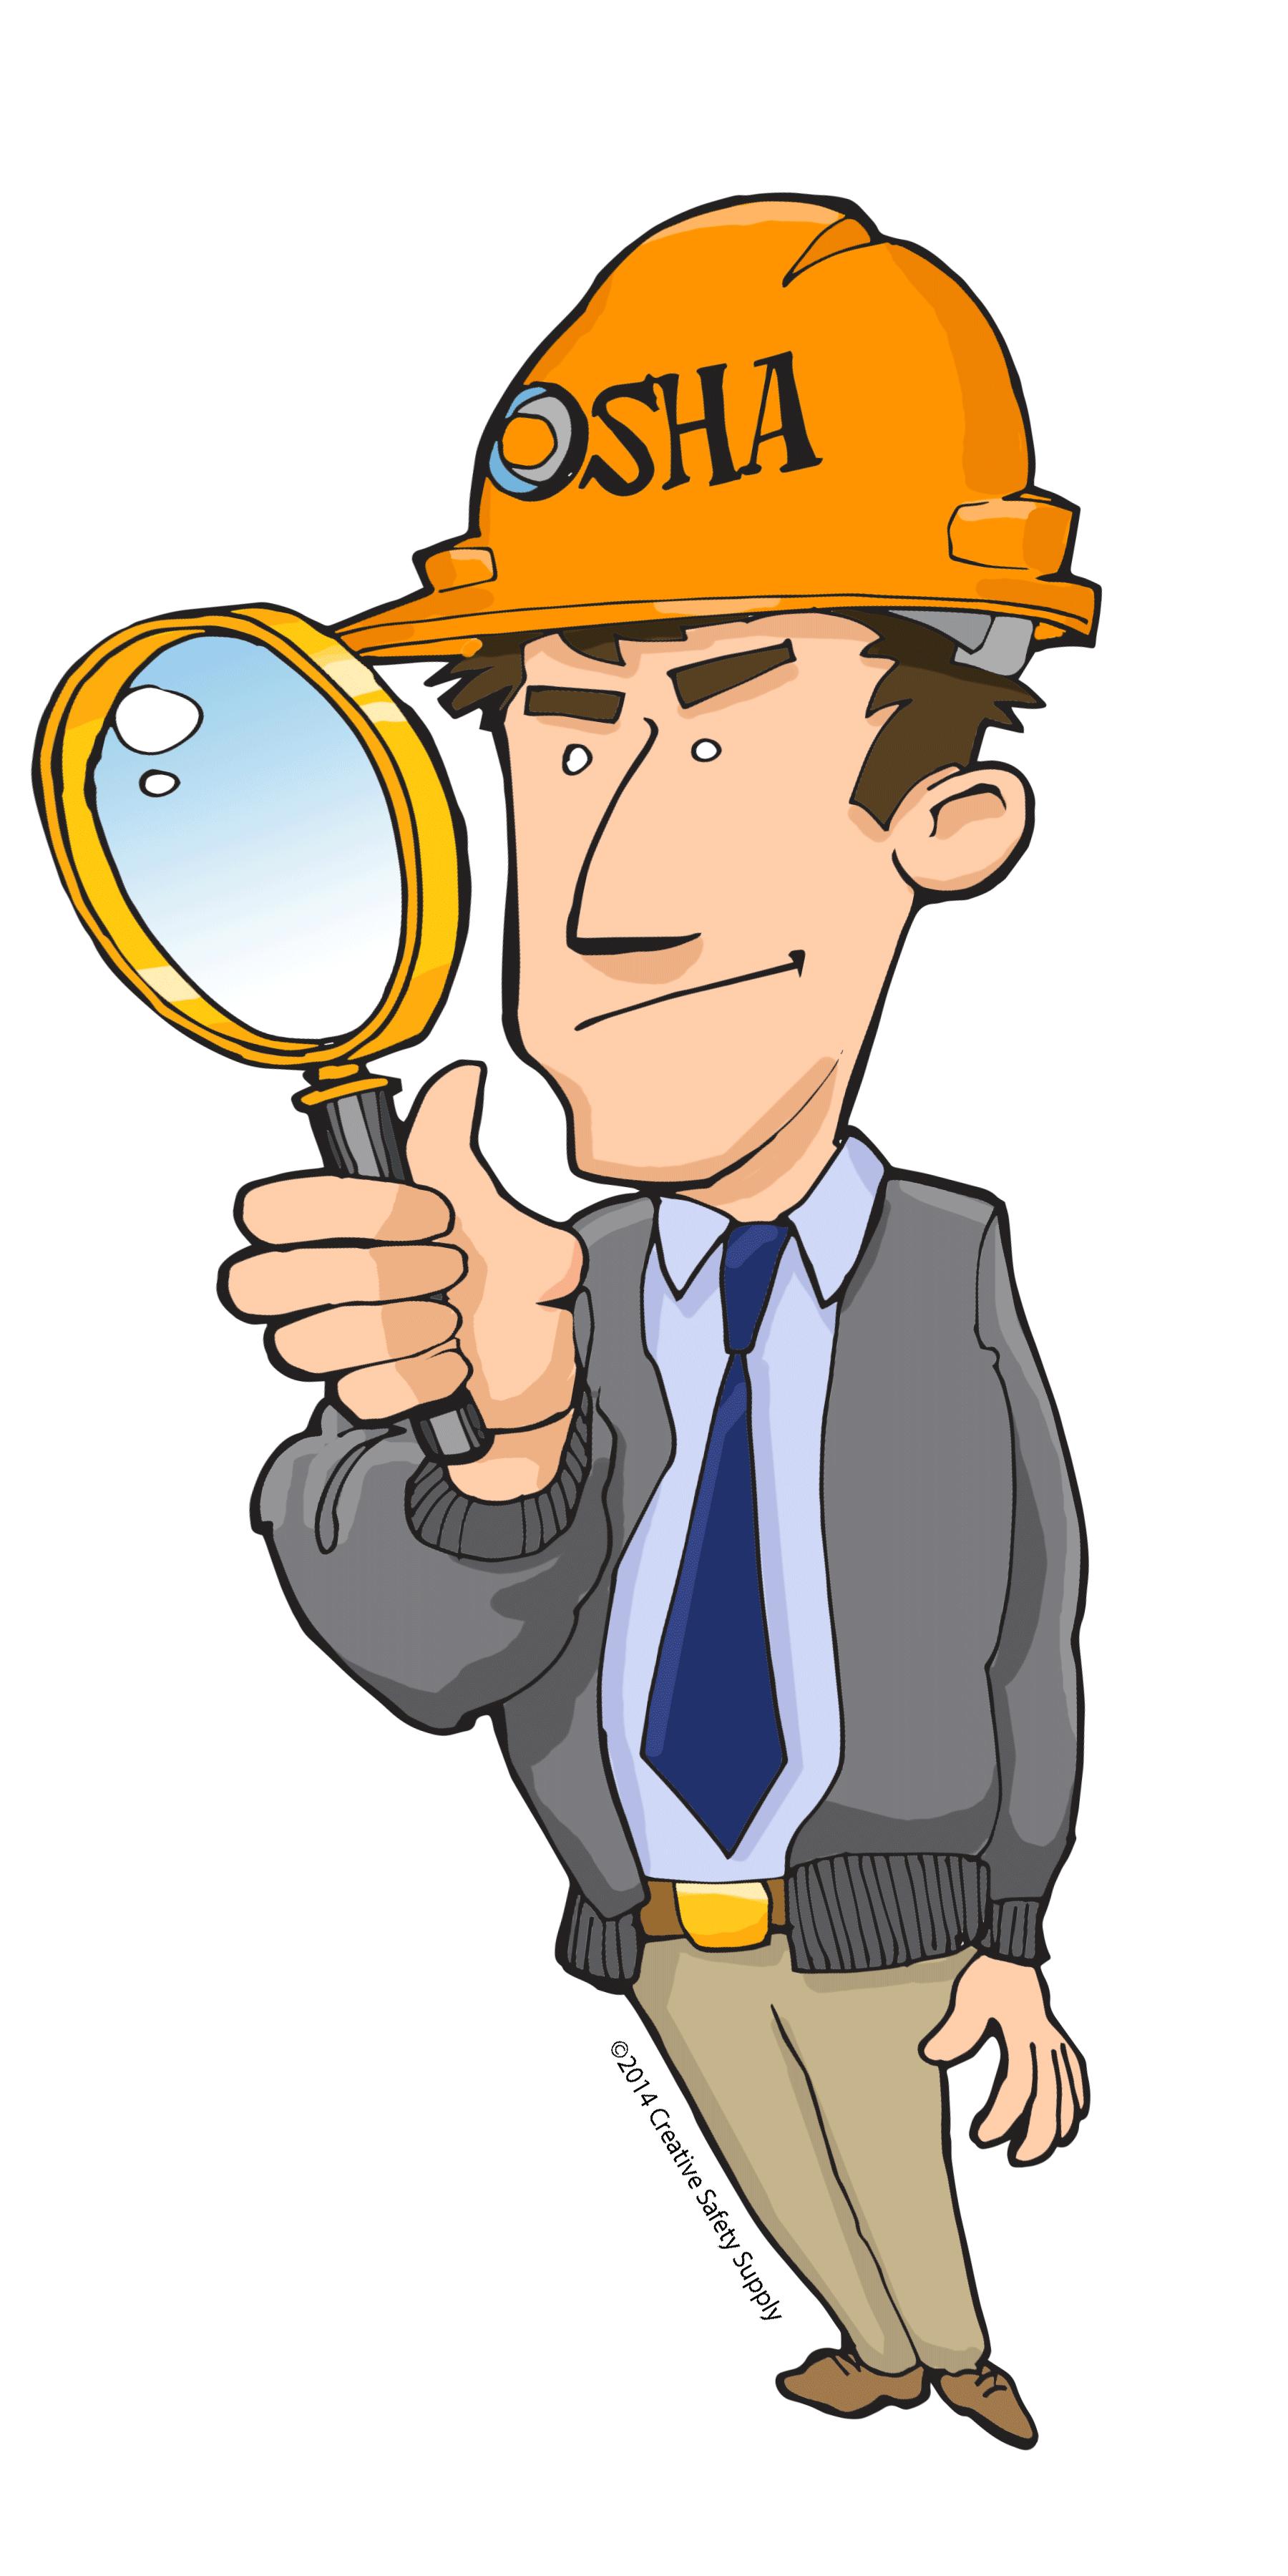 Osha ingenious inspiration near. Data clipart inspector